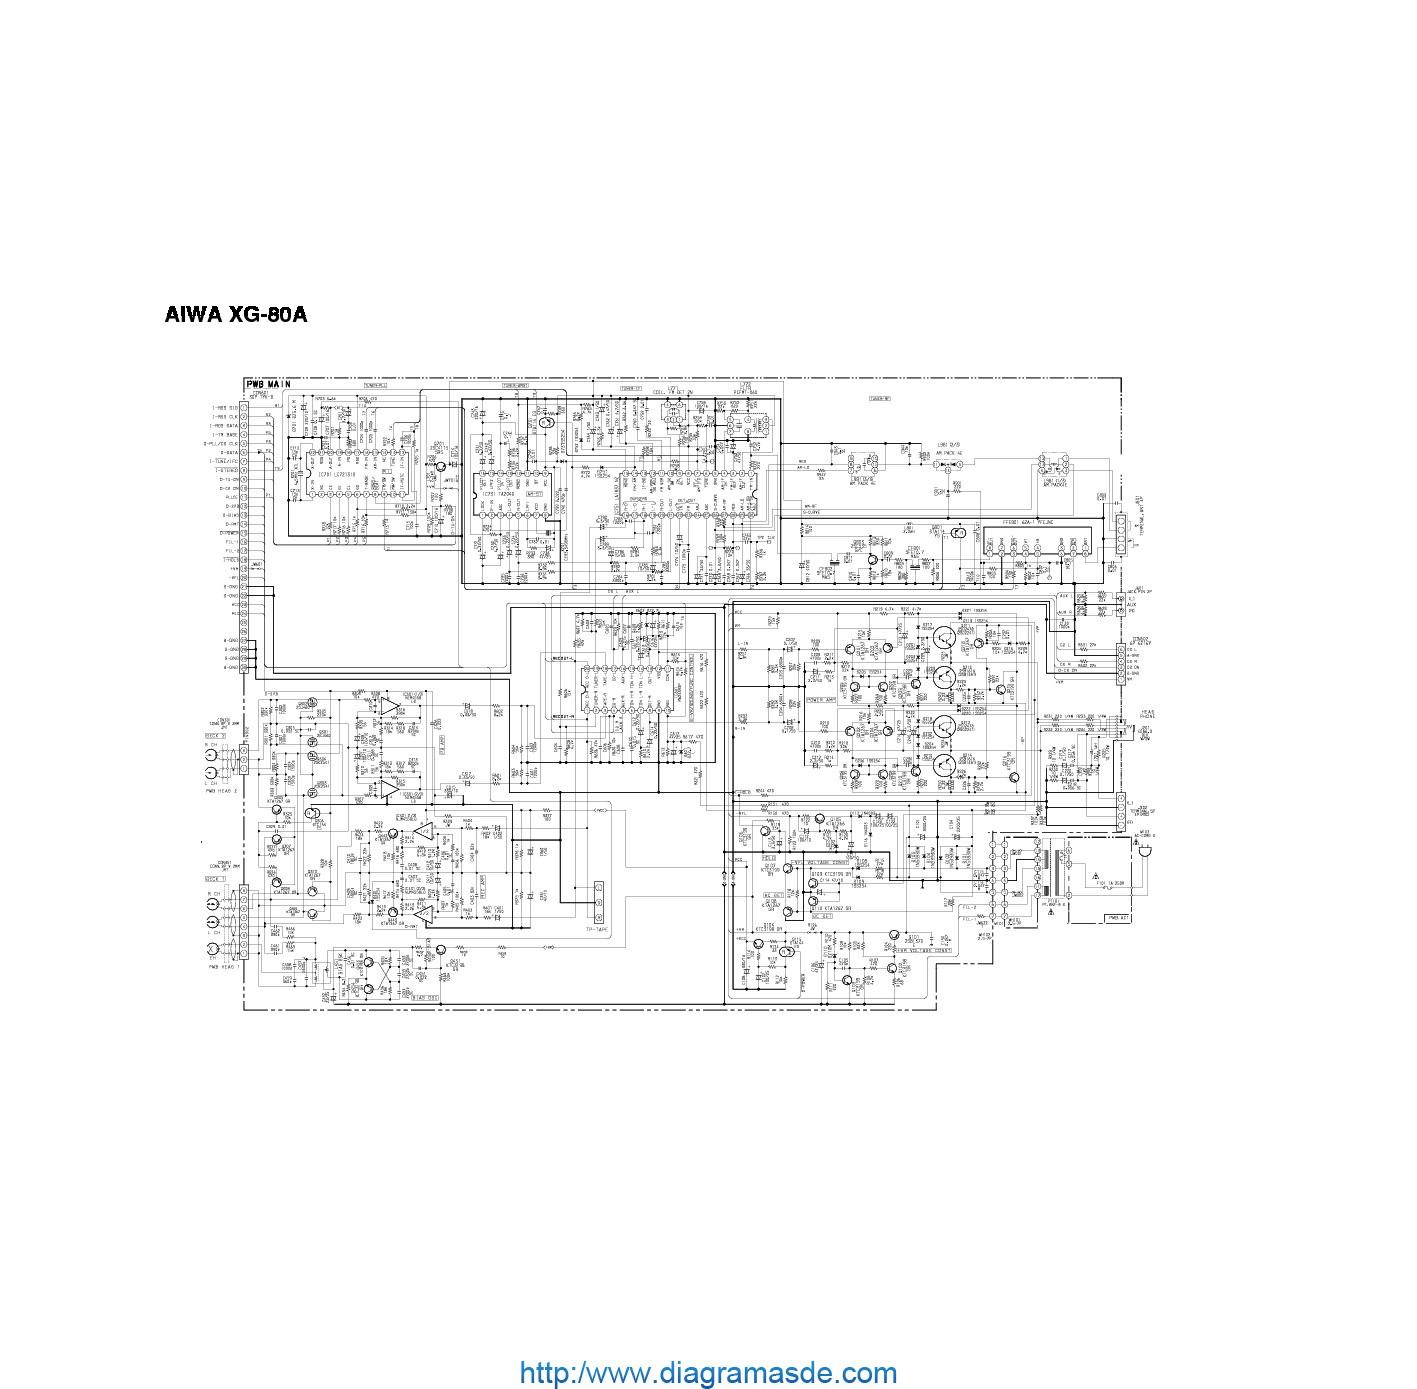 Aiwa XG-80A.pdf